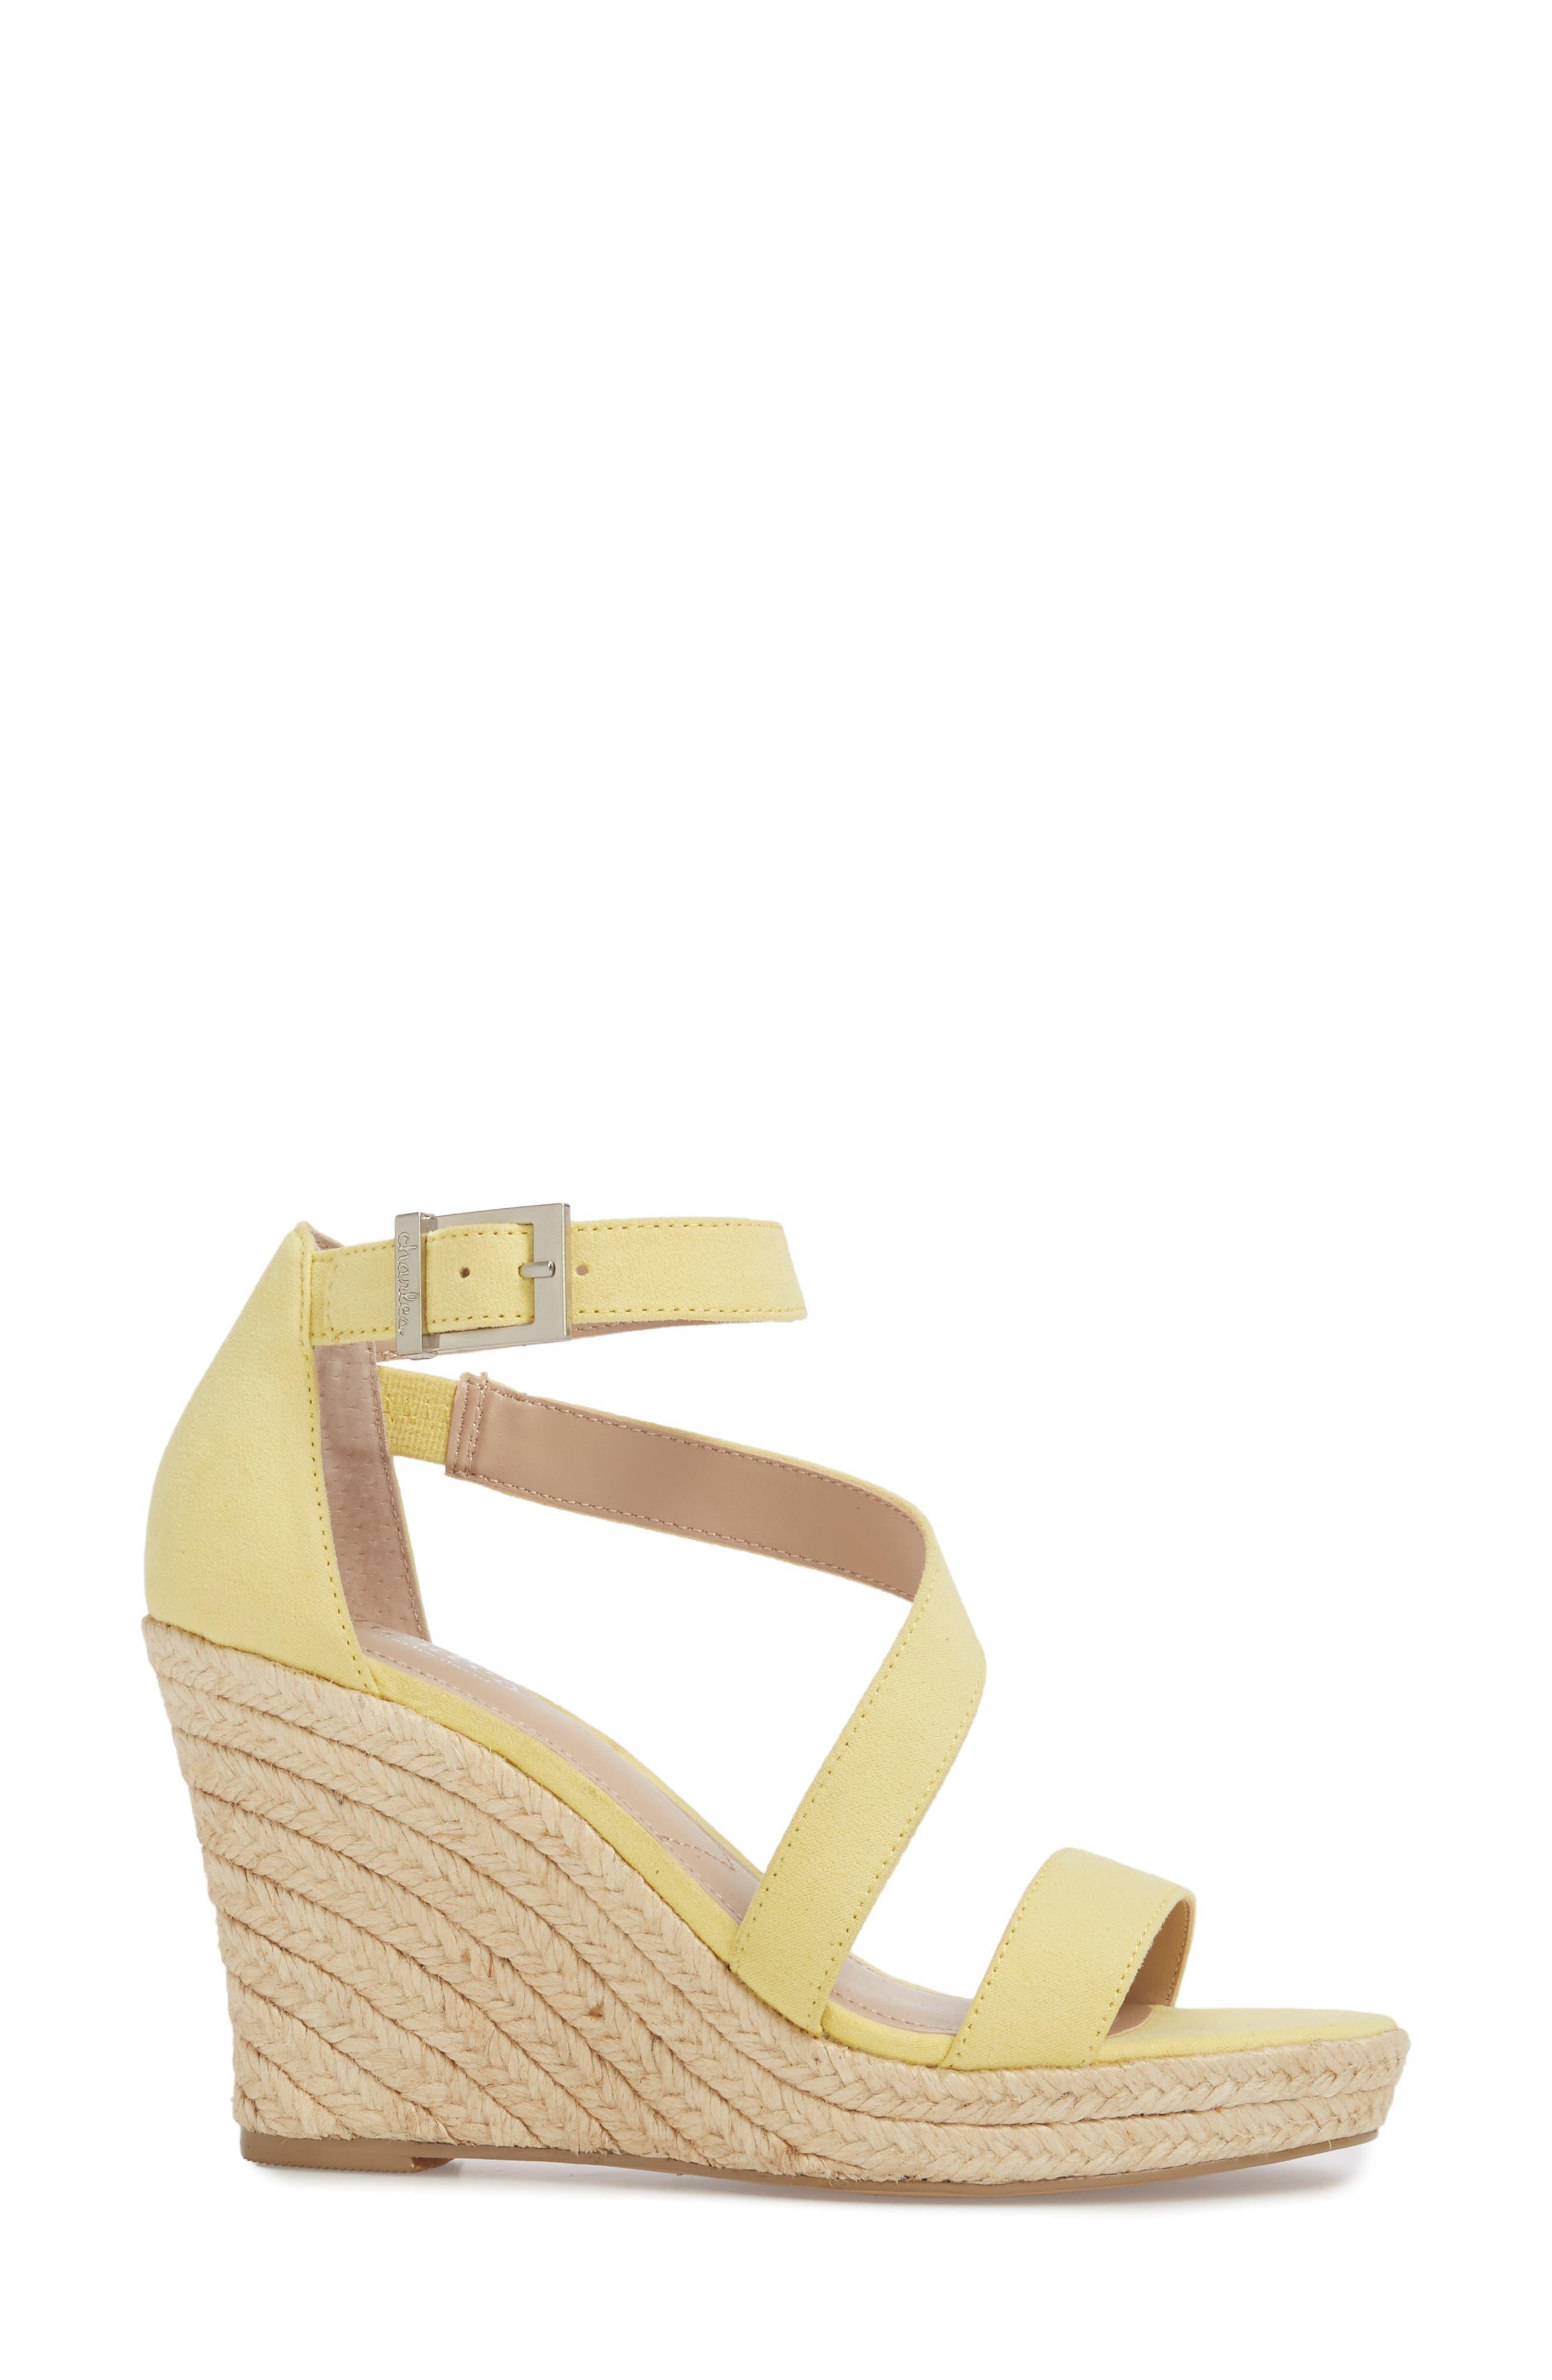 Lou Asymmetrical Wedge Sandal,                             Alternate thumbnail 3, color,                             BUTTERCUP SUEDE